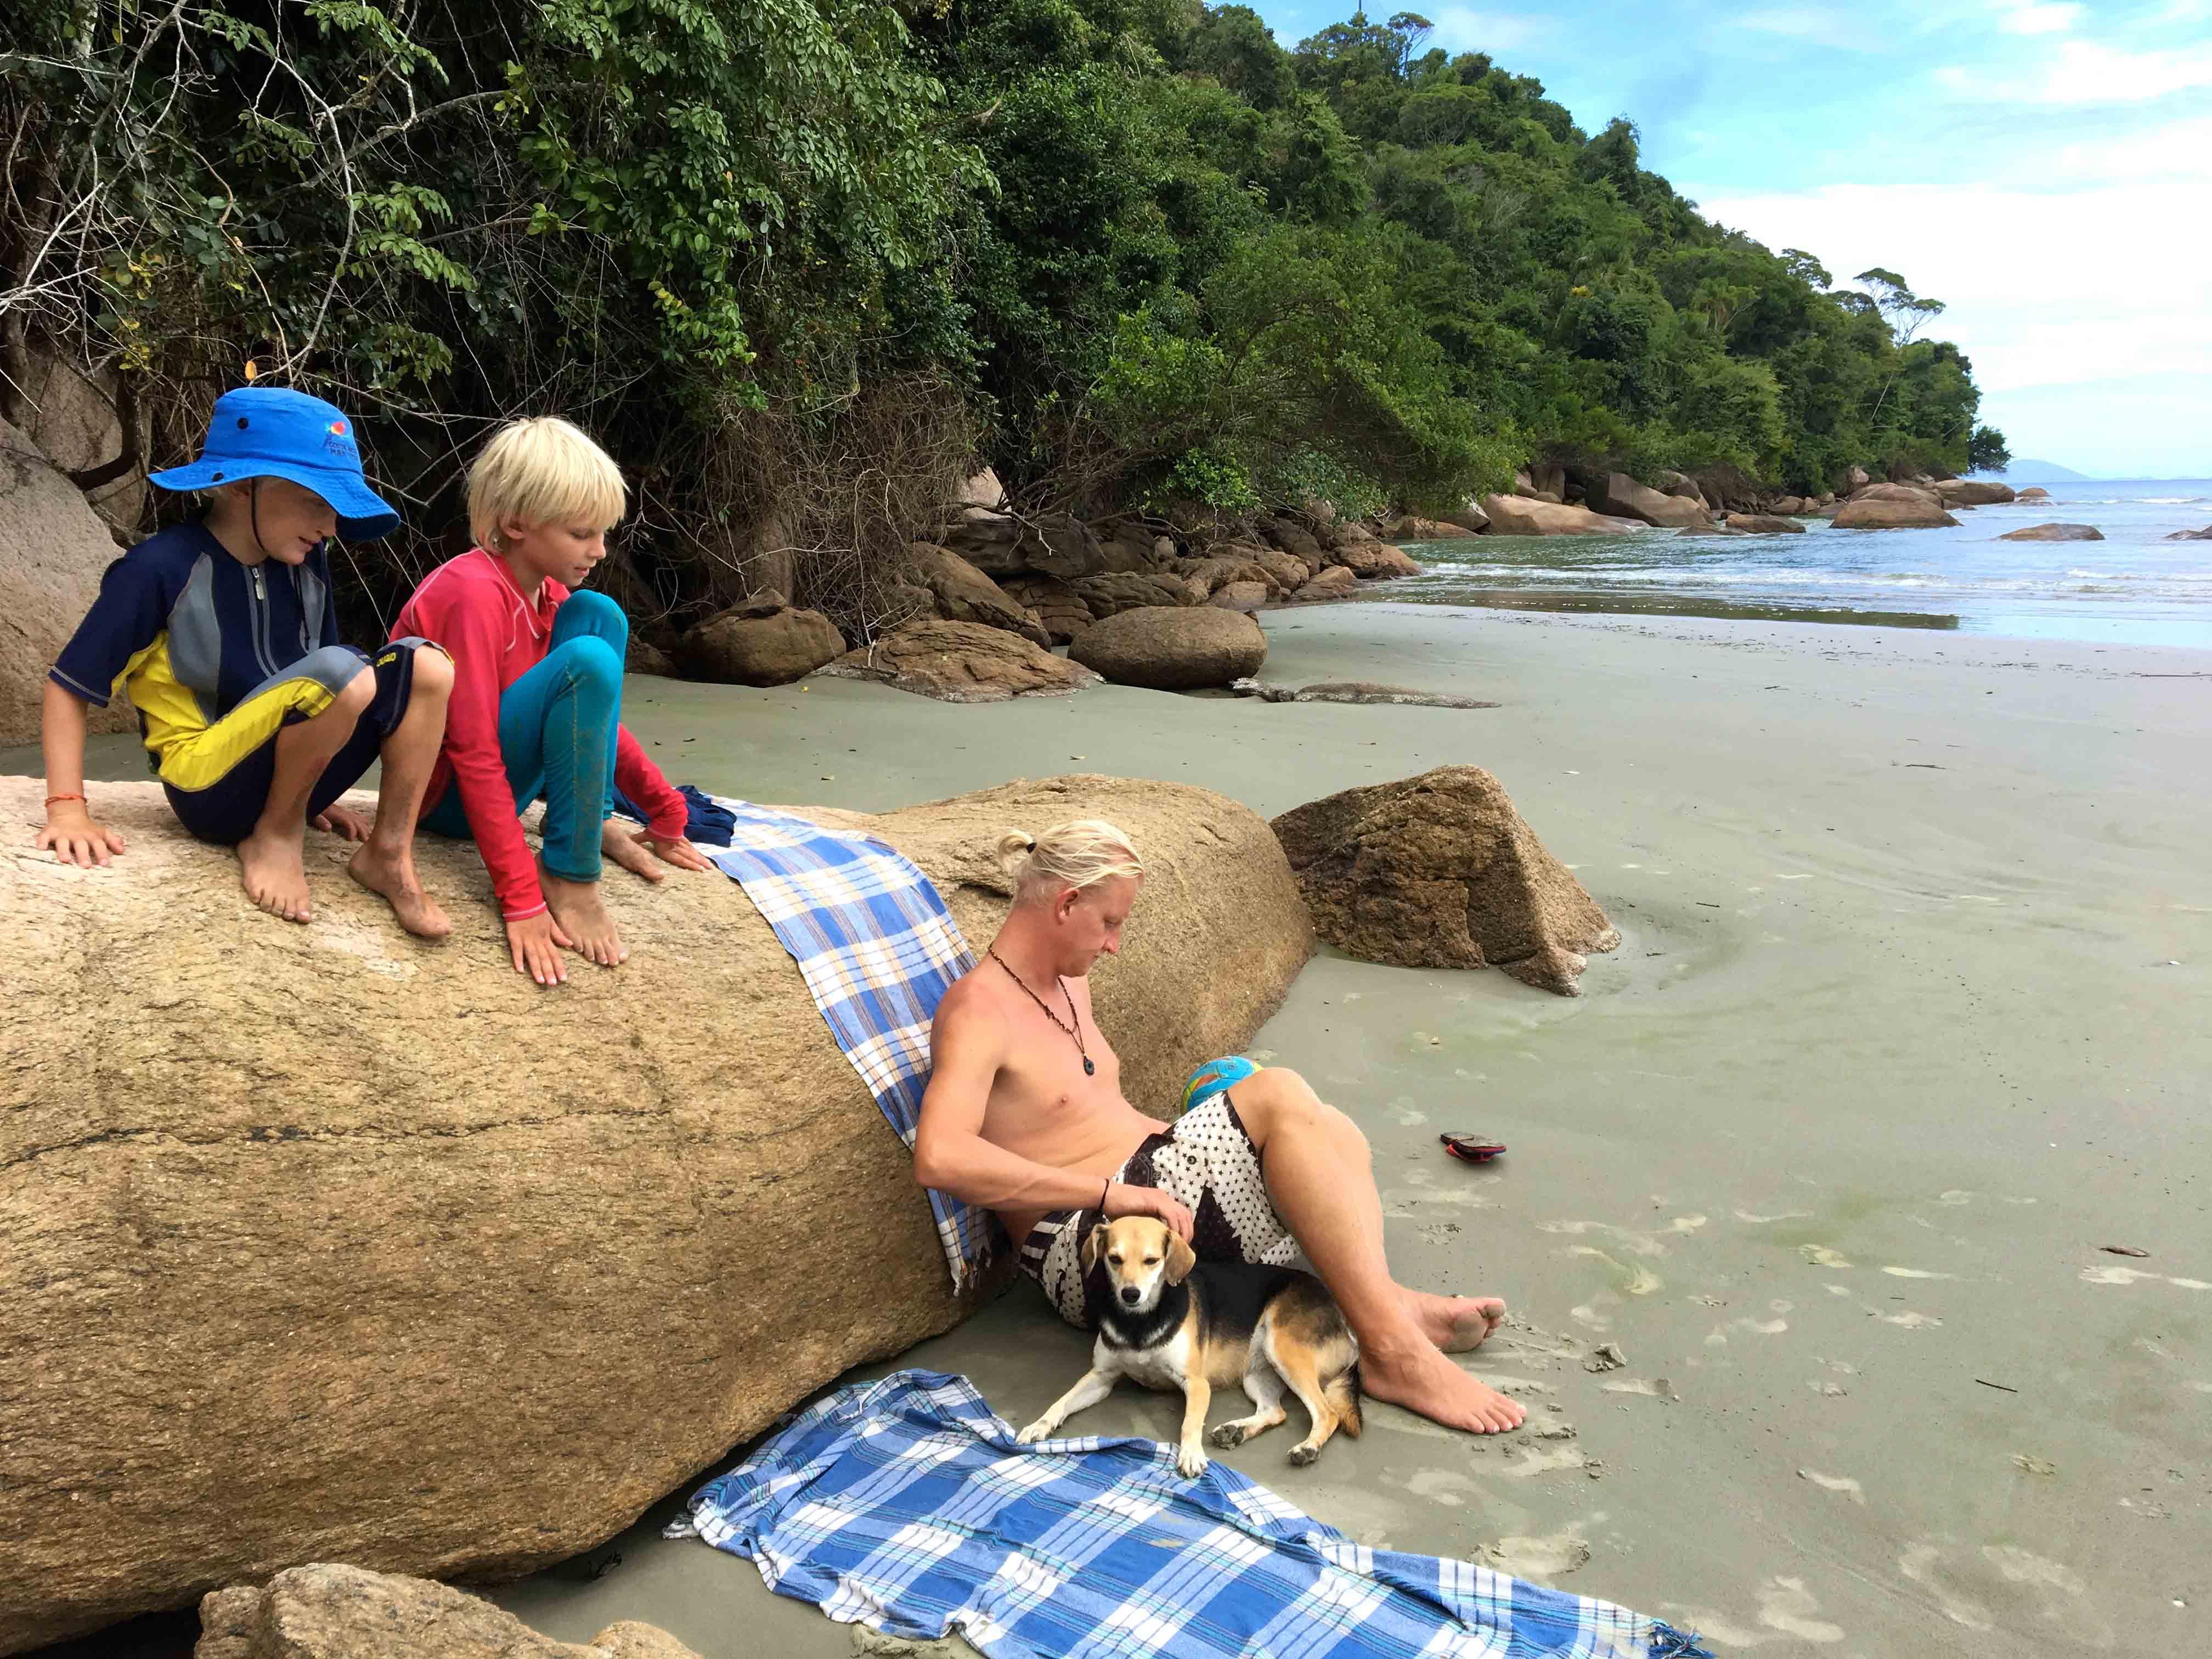 picinguaba stranddag